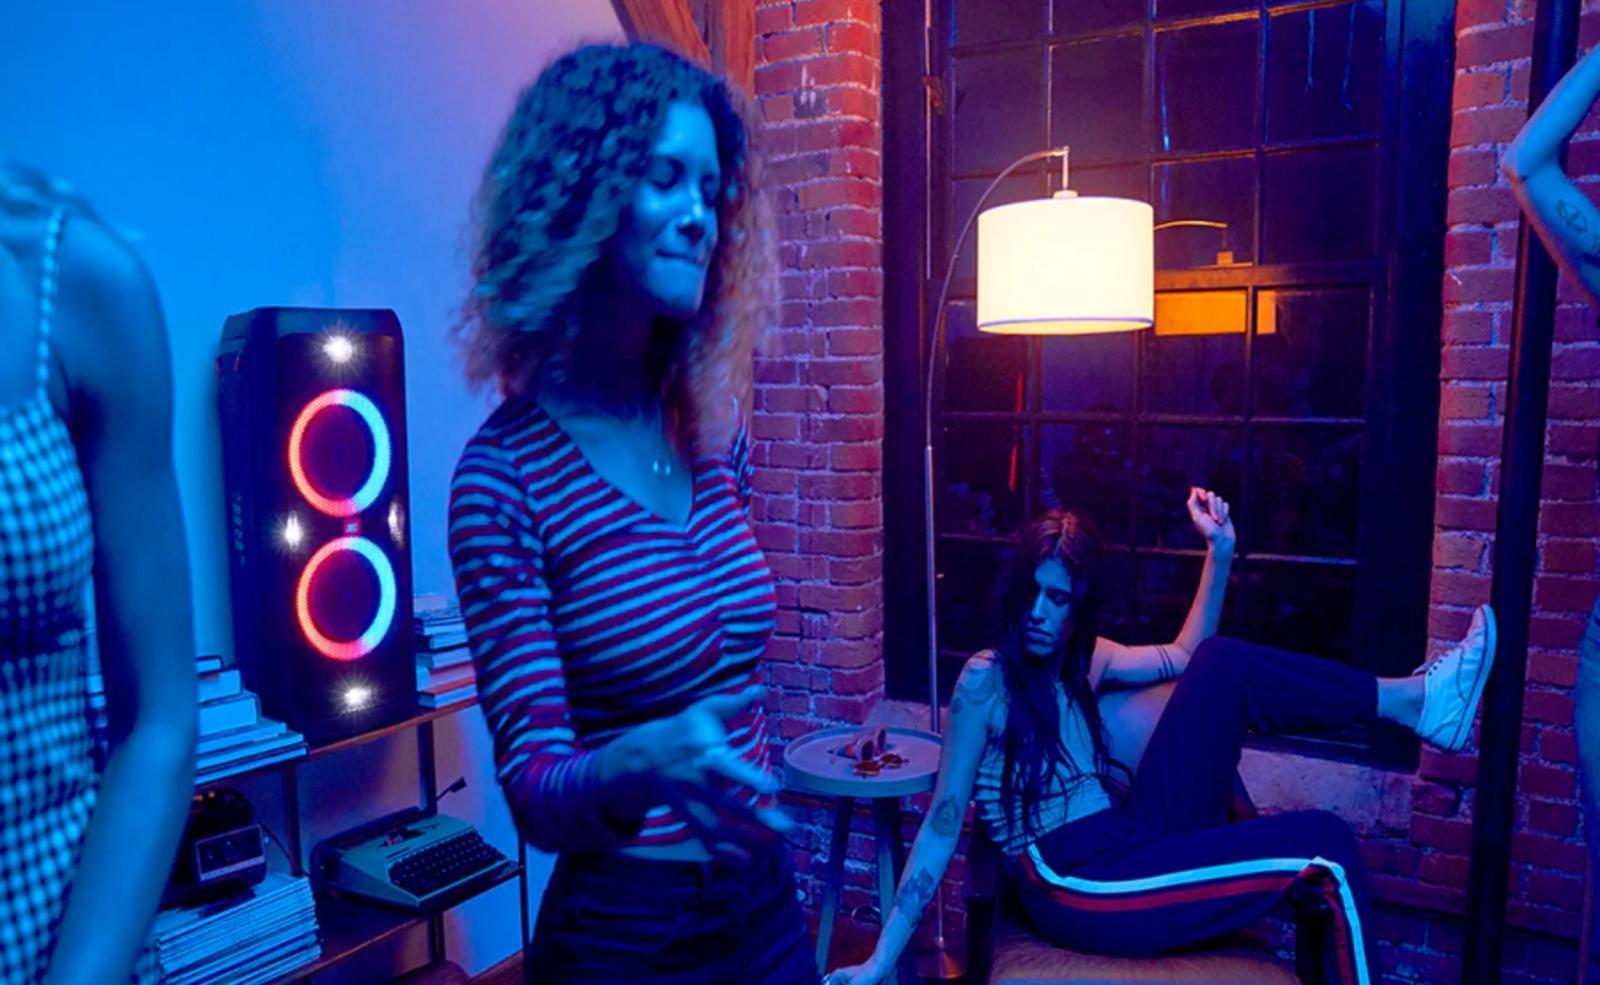 JBL Boombox XL Bluetooth Speaker Waterproof Party Favors 24